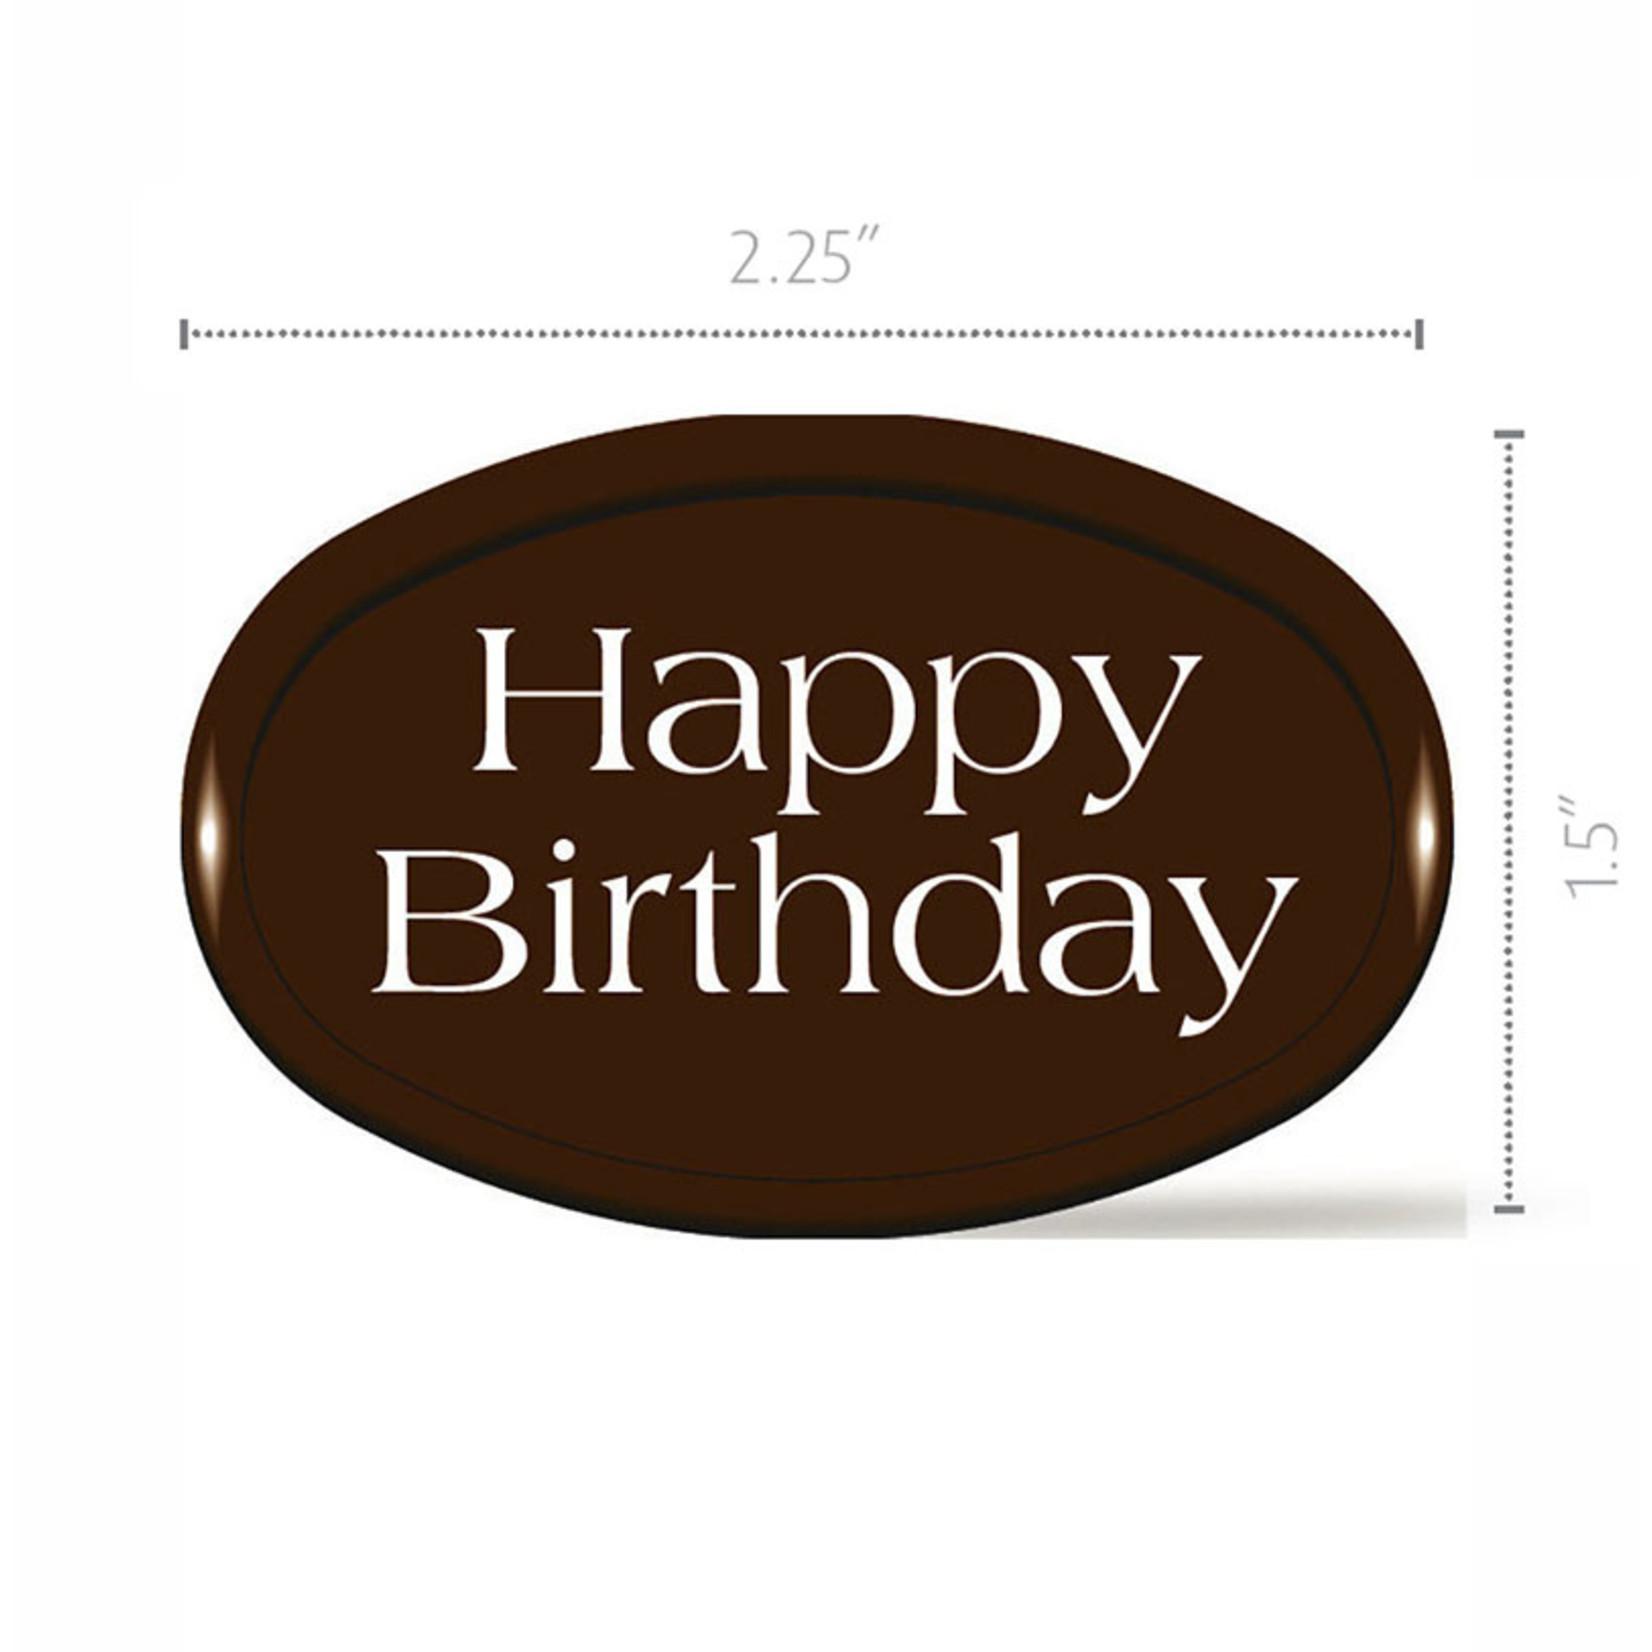 Dobla Dobla - Chocolate Happy Birthday (140ct), 91019